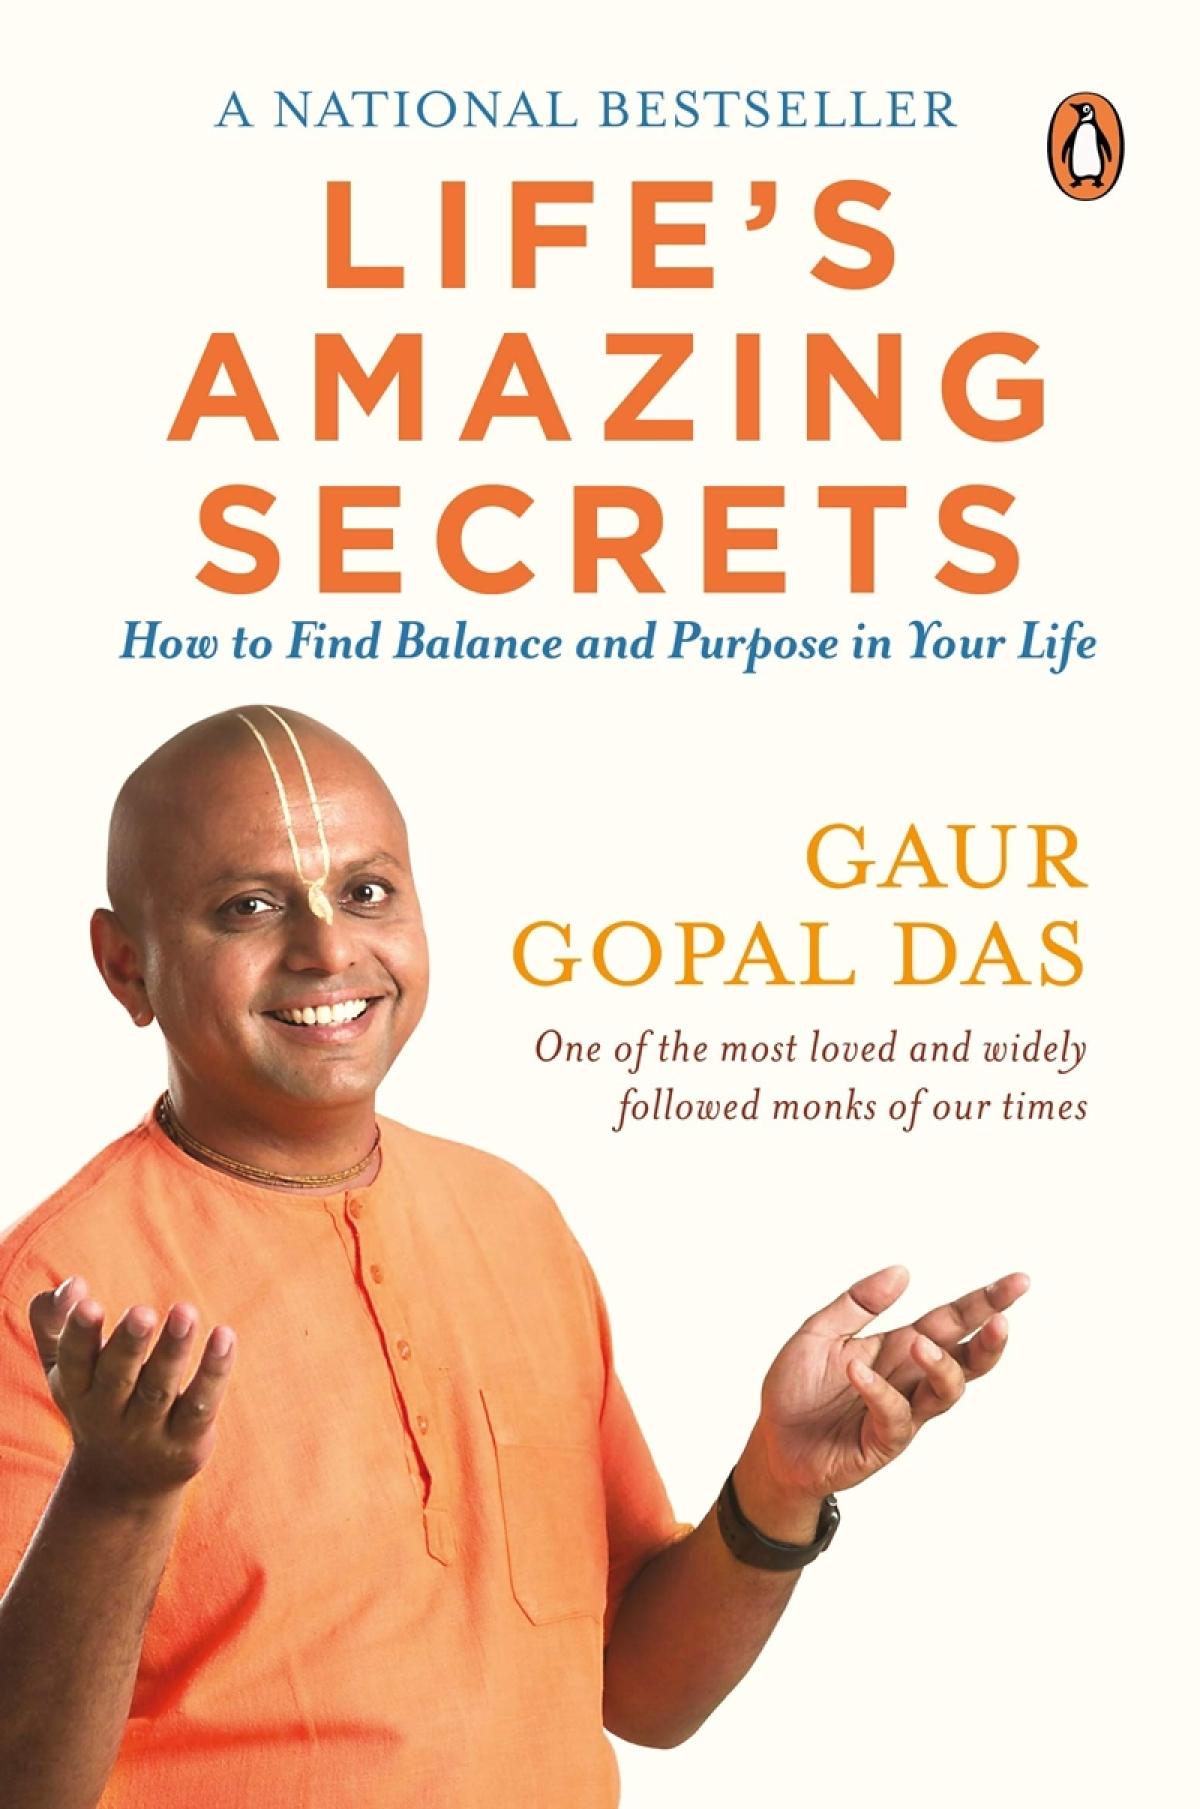 Life's Amazing Secrets by Gaur Gopal Das: Review